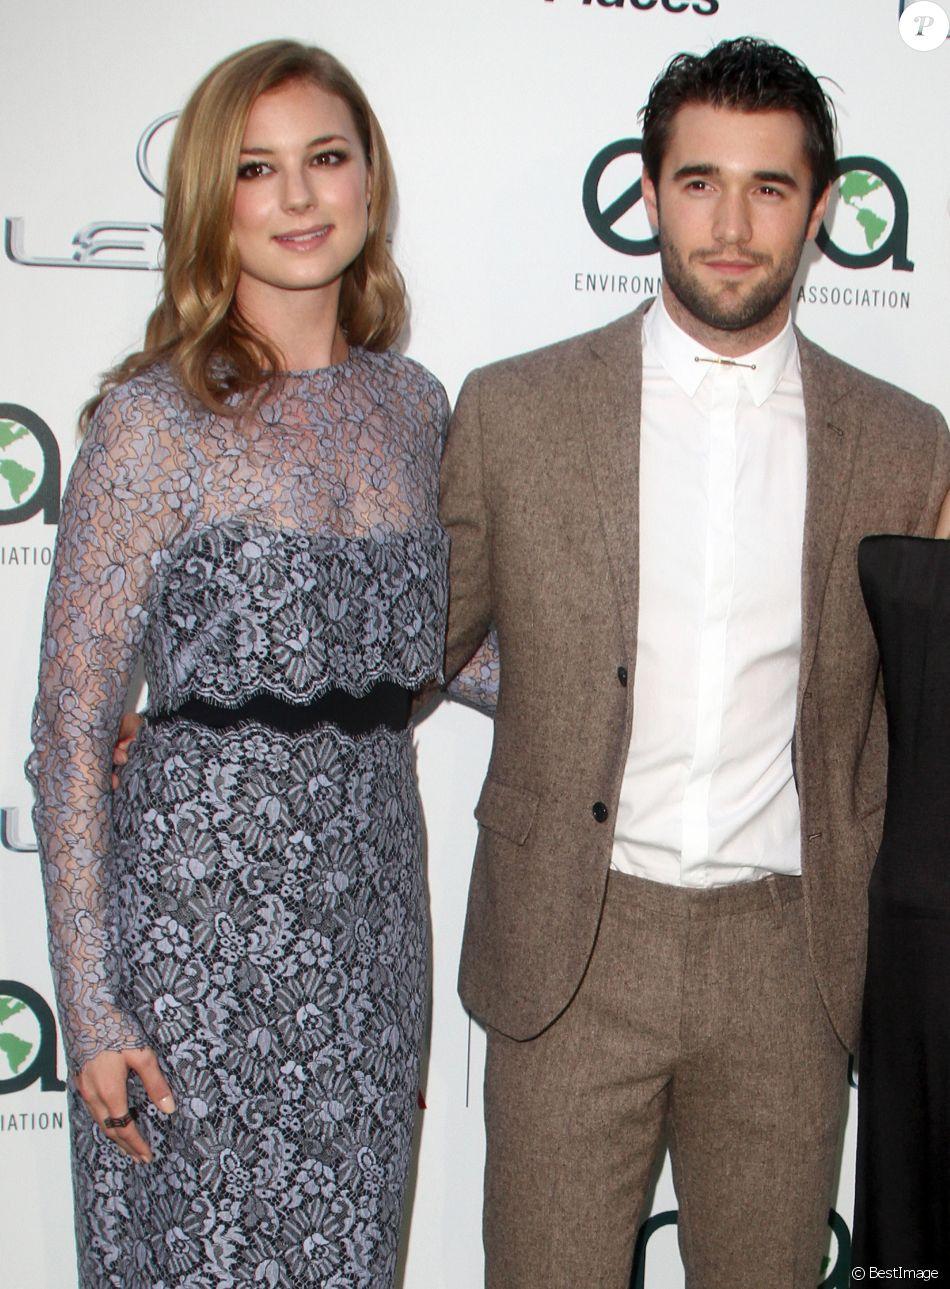 Emily VanCamp, Joshua Bowman - Tapis rouge du Annual Environmental Media Awards à Los Angeles Le 18 Octobre 2014